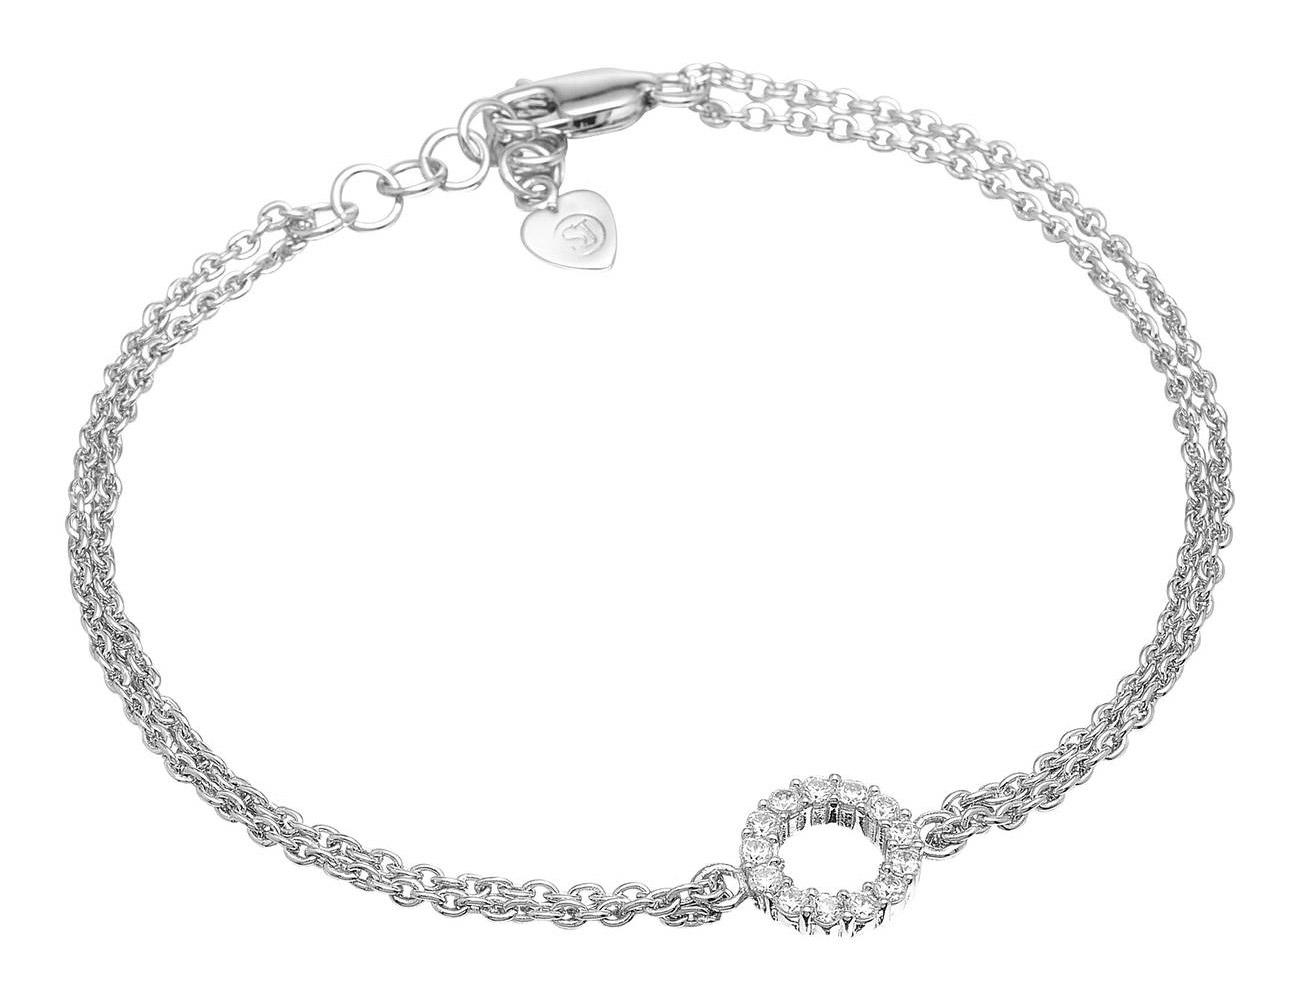 bei Uhrcenter: Sif Jakobs Jewellery SJ-B337(1)-CZ Silber-Armband Biella Piccolo - Schmuck